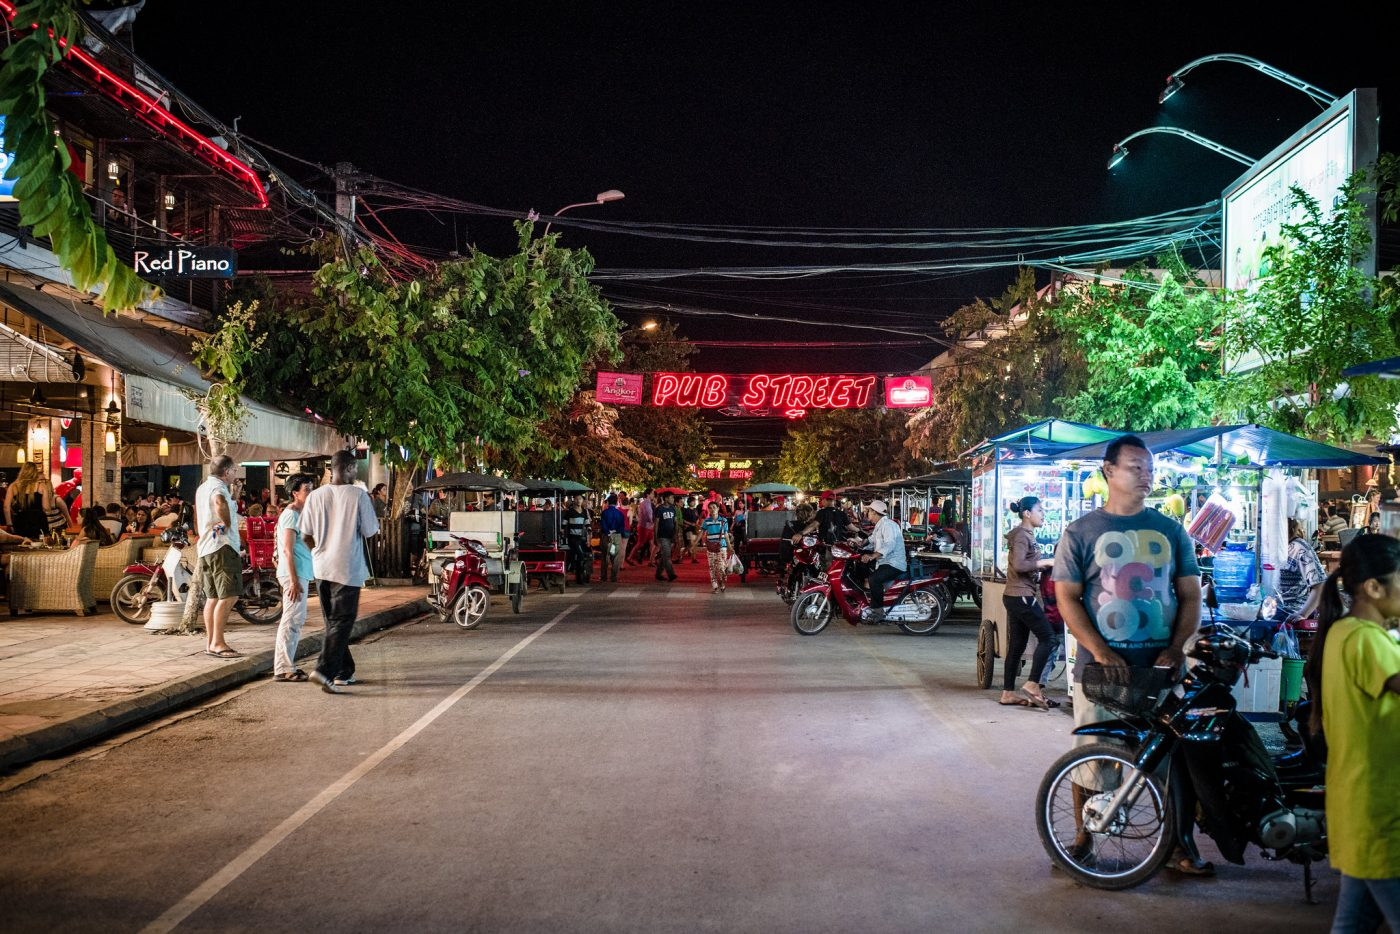 Pub Street, Siem Reap, Cambodia. Photo by Alan Wat via Flickr CC